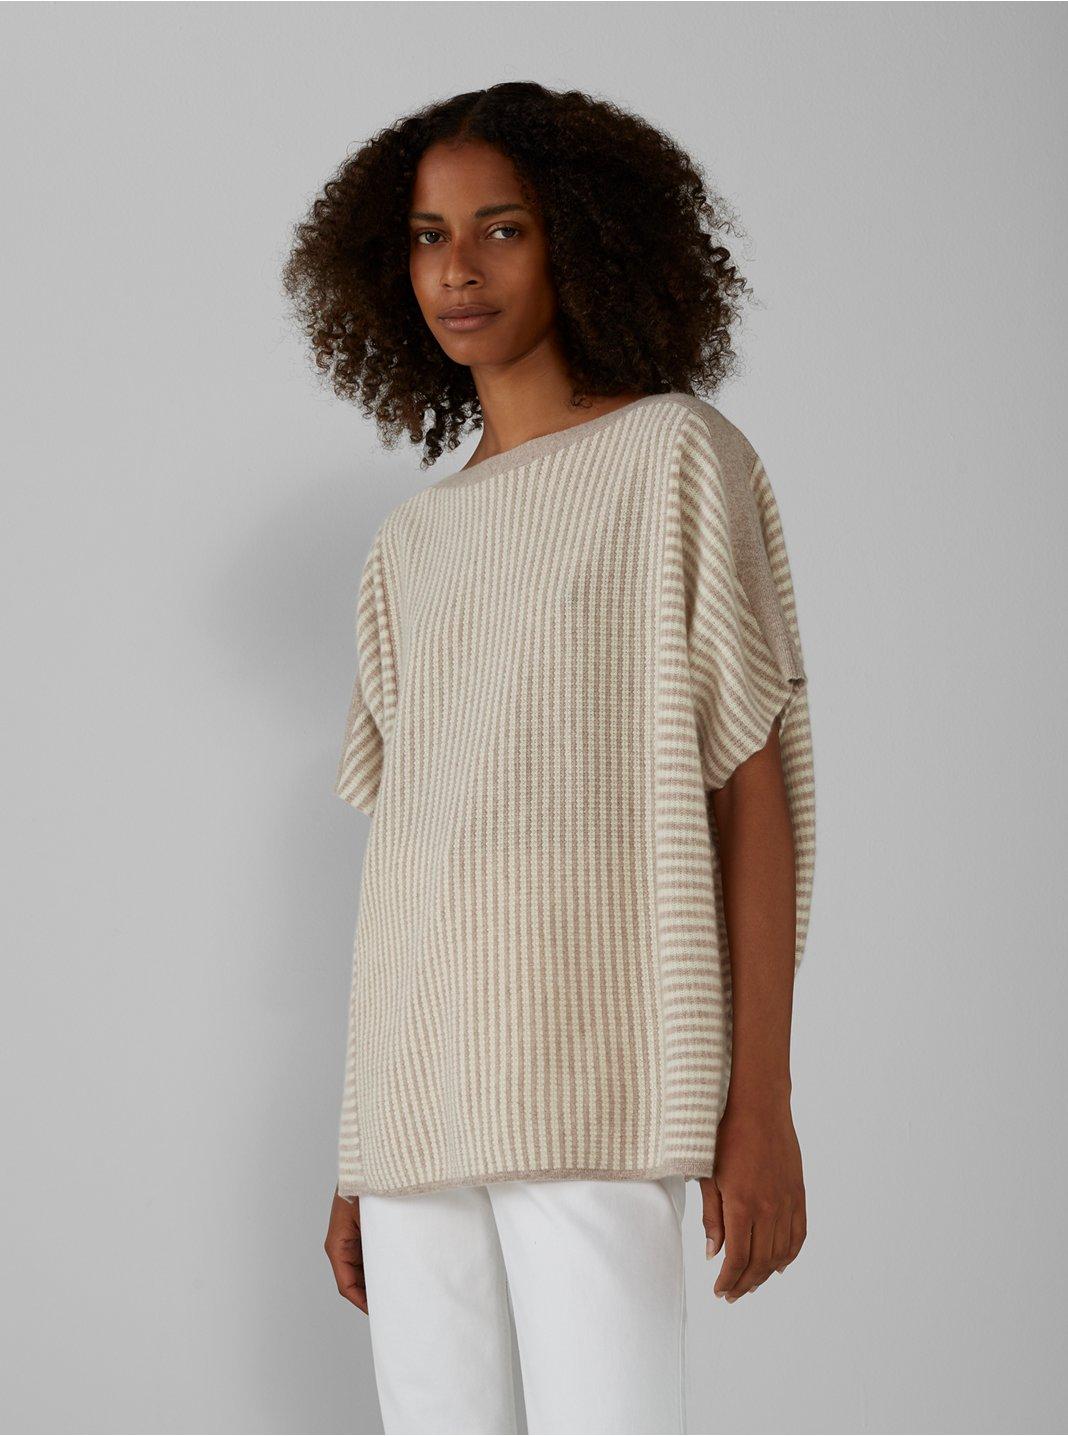 Multi-Stitch Cashmere Egg Sweater